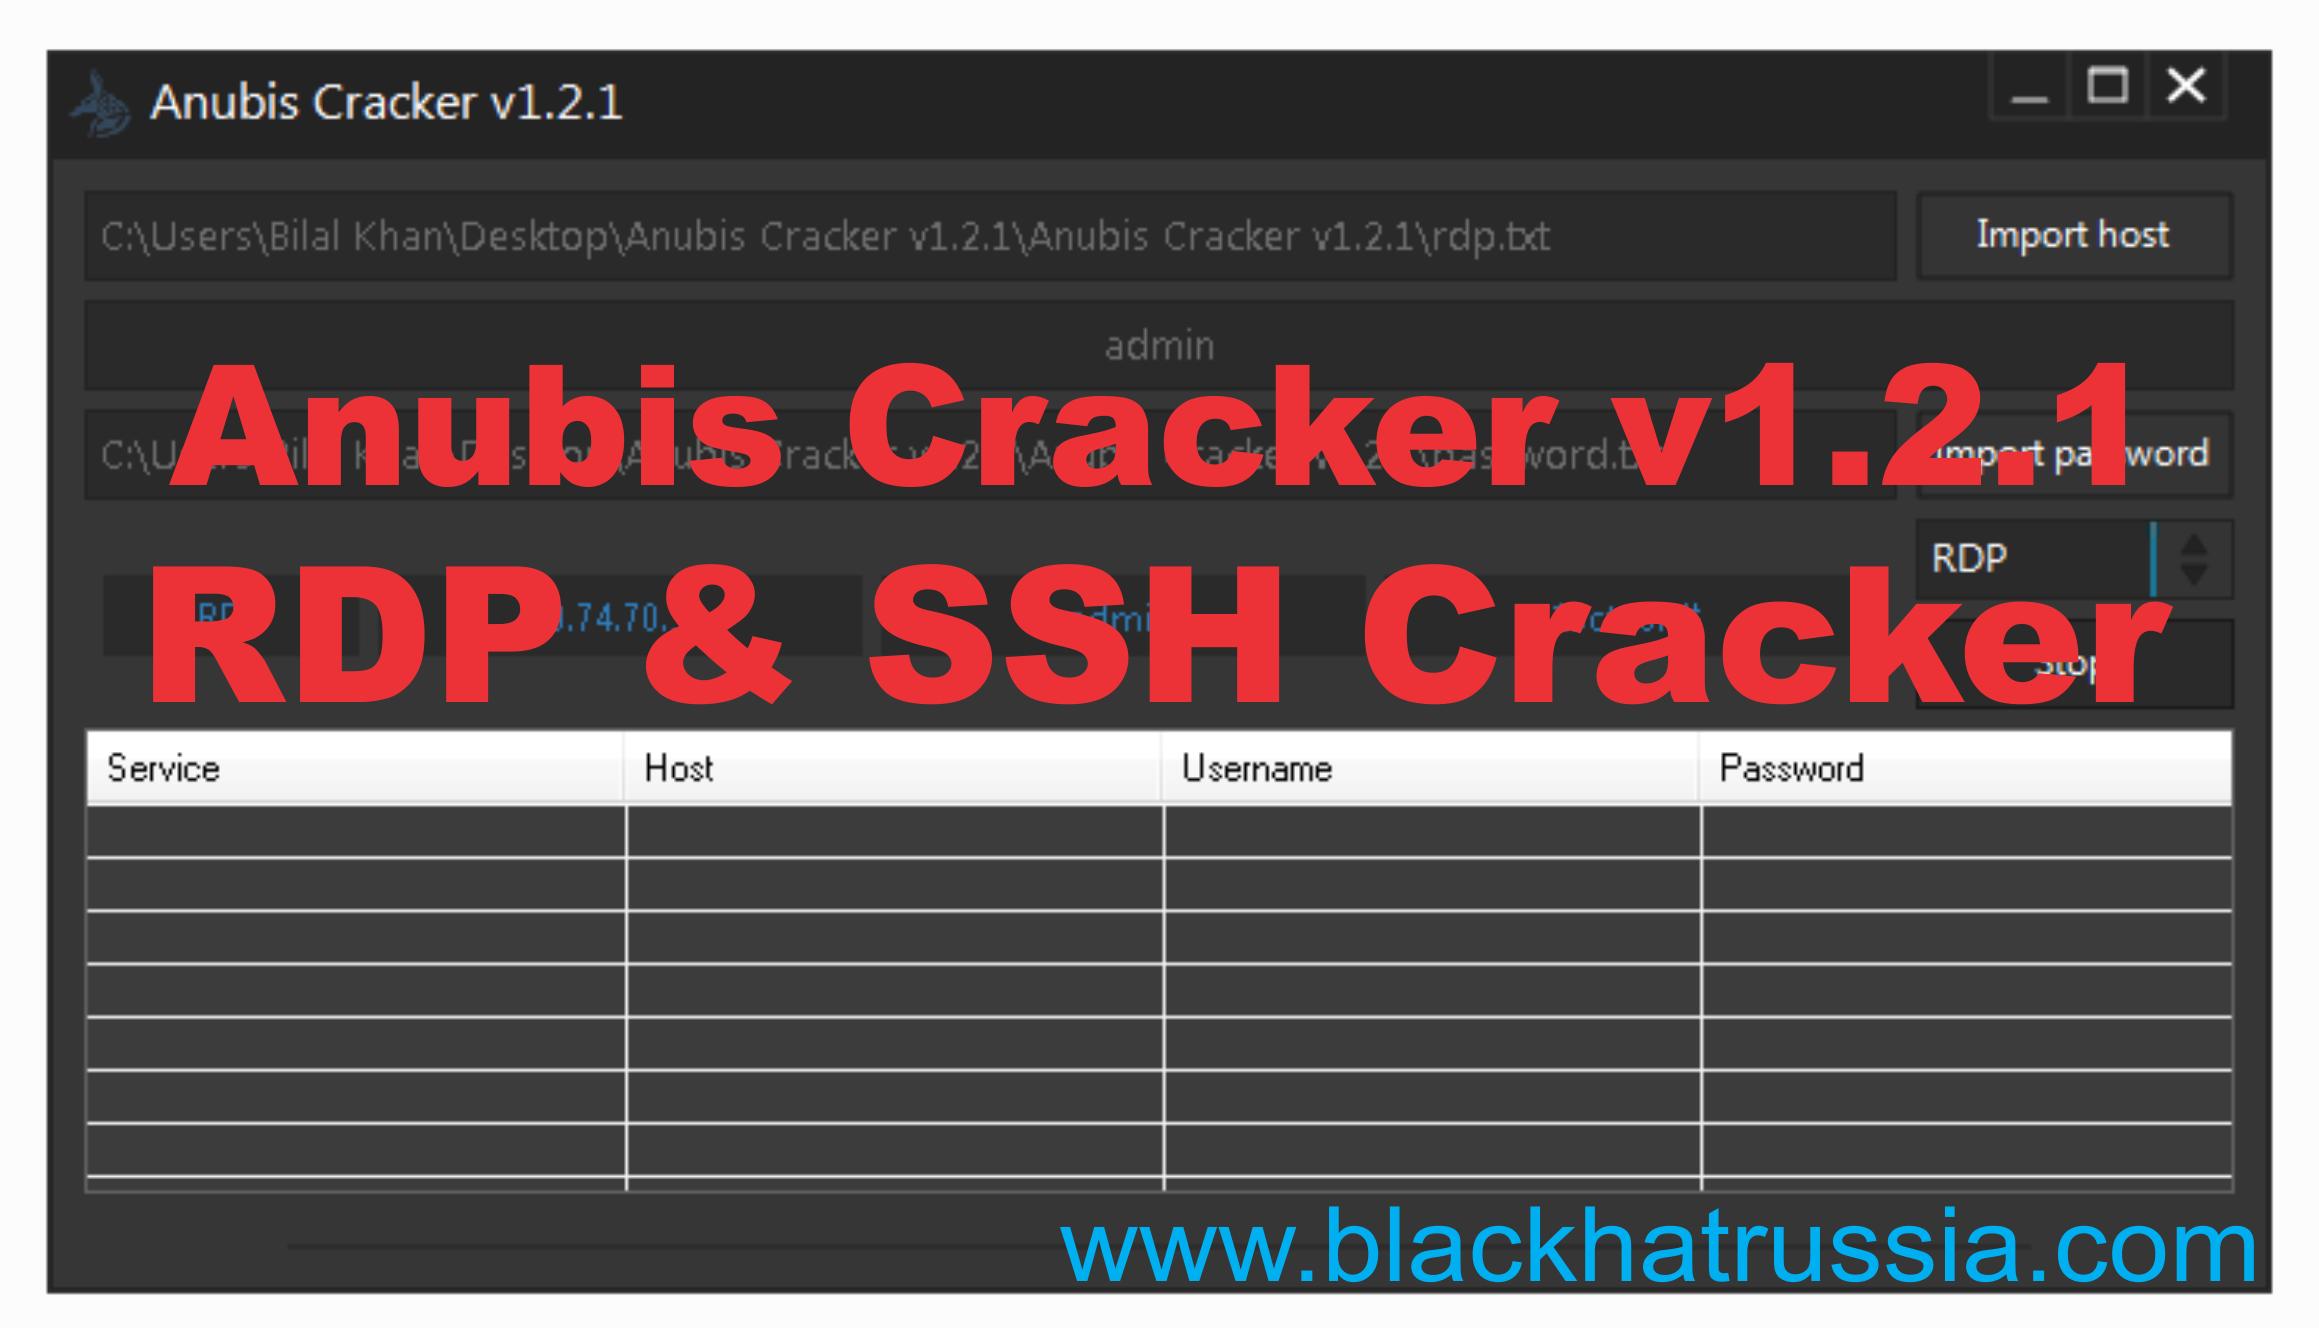 Anubis Cracker v1.2.1 RDP SSH cracker